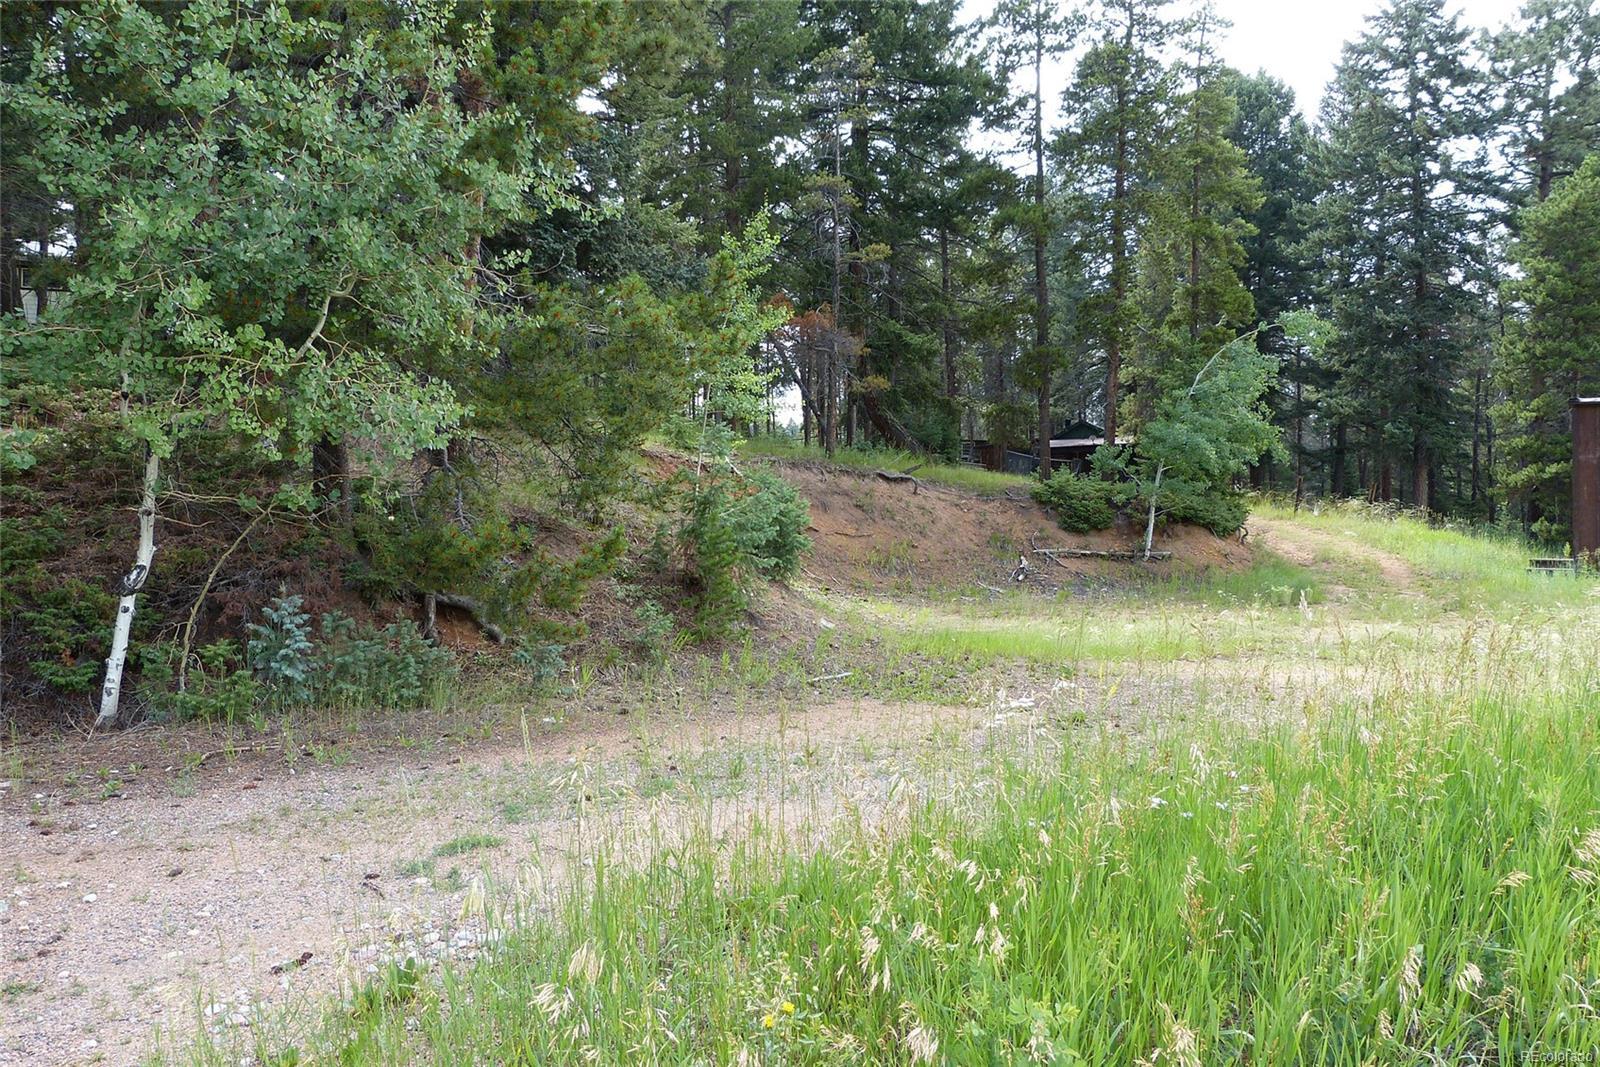 00000 State Highway 73, Conifer, CO 80433 - Conifer, CO real estate listing